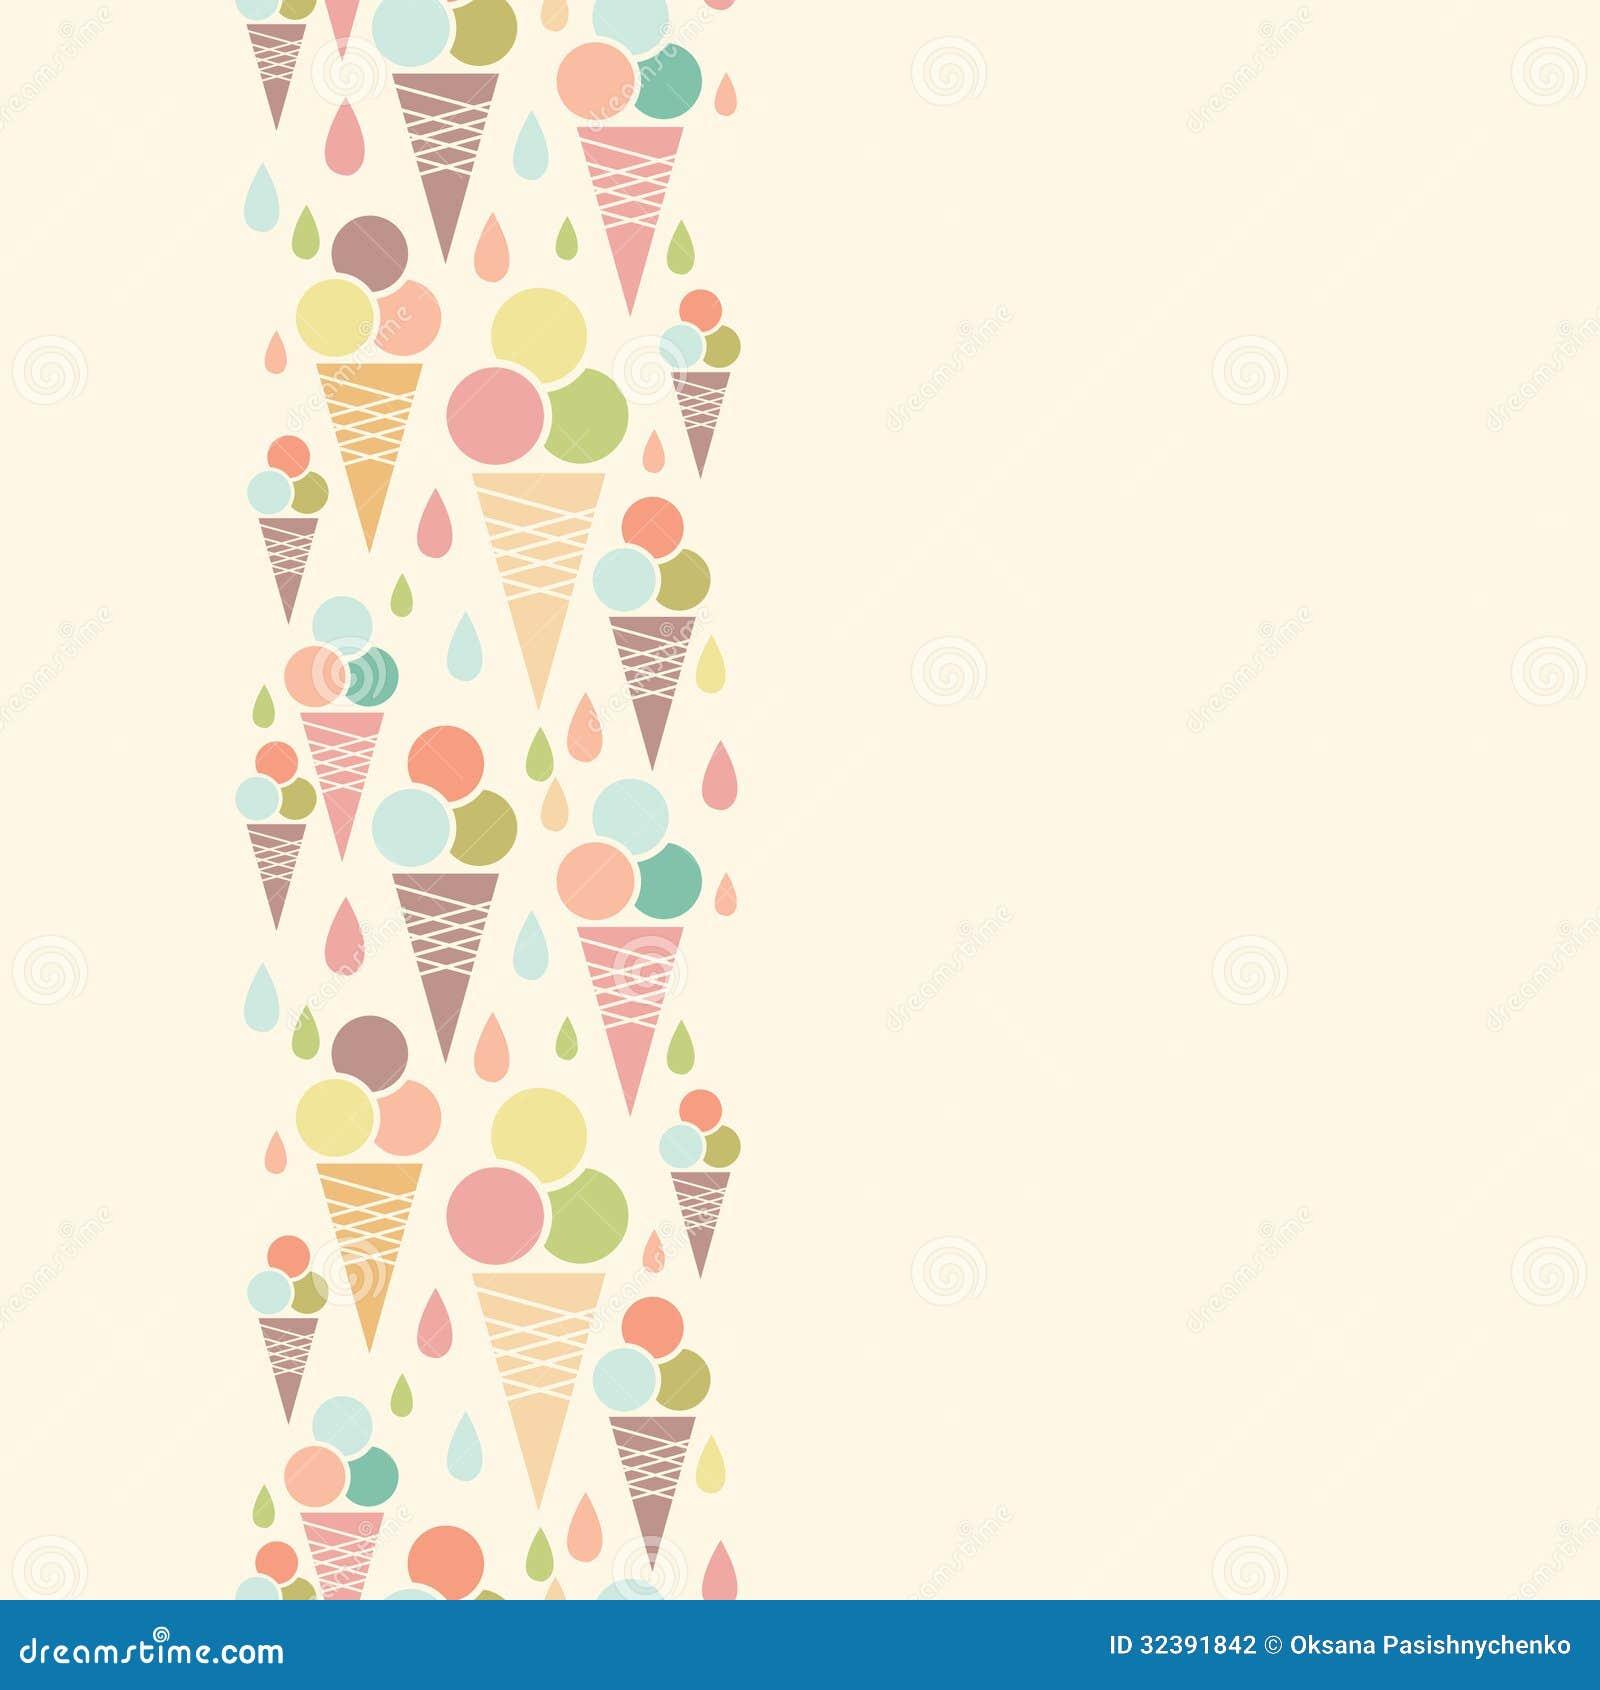 Ice Cream Cones Seamless Pattern Background Stock Vector: Ice Cream Cones Vertical Seamless Pattern Stock Vector